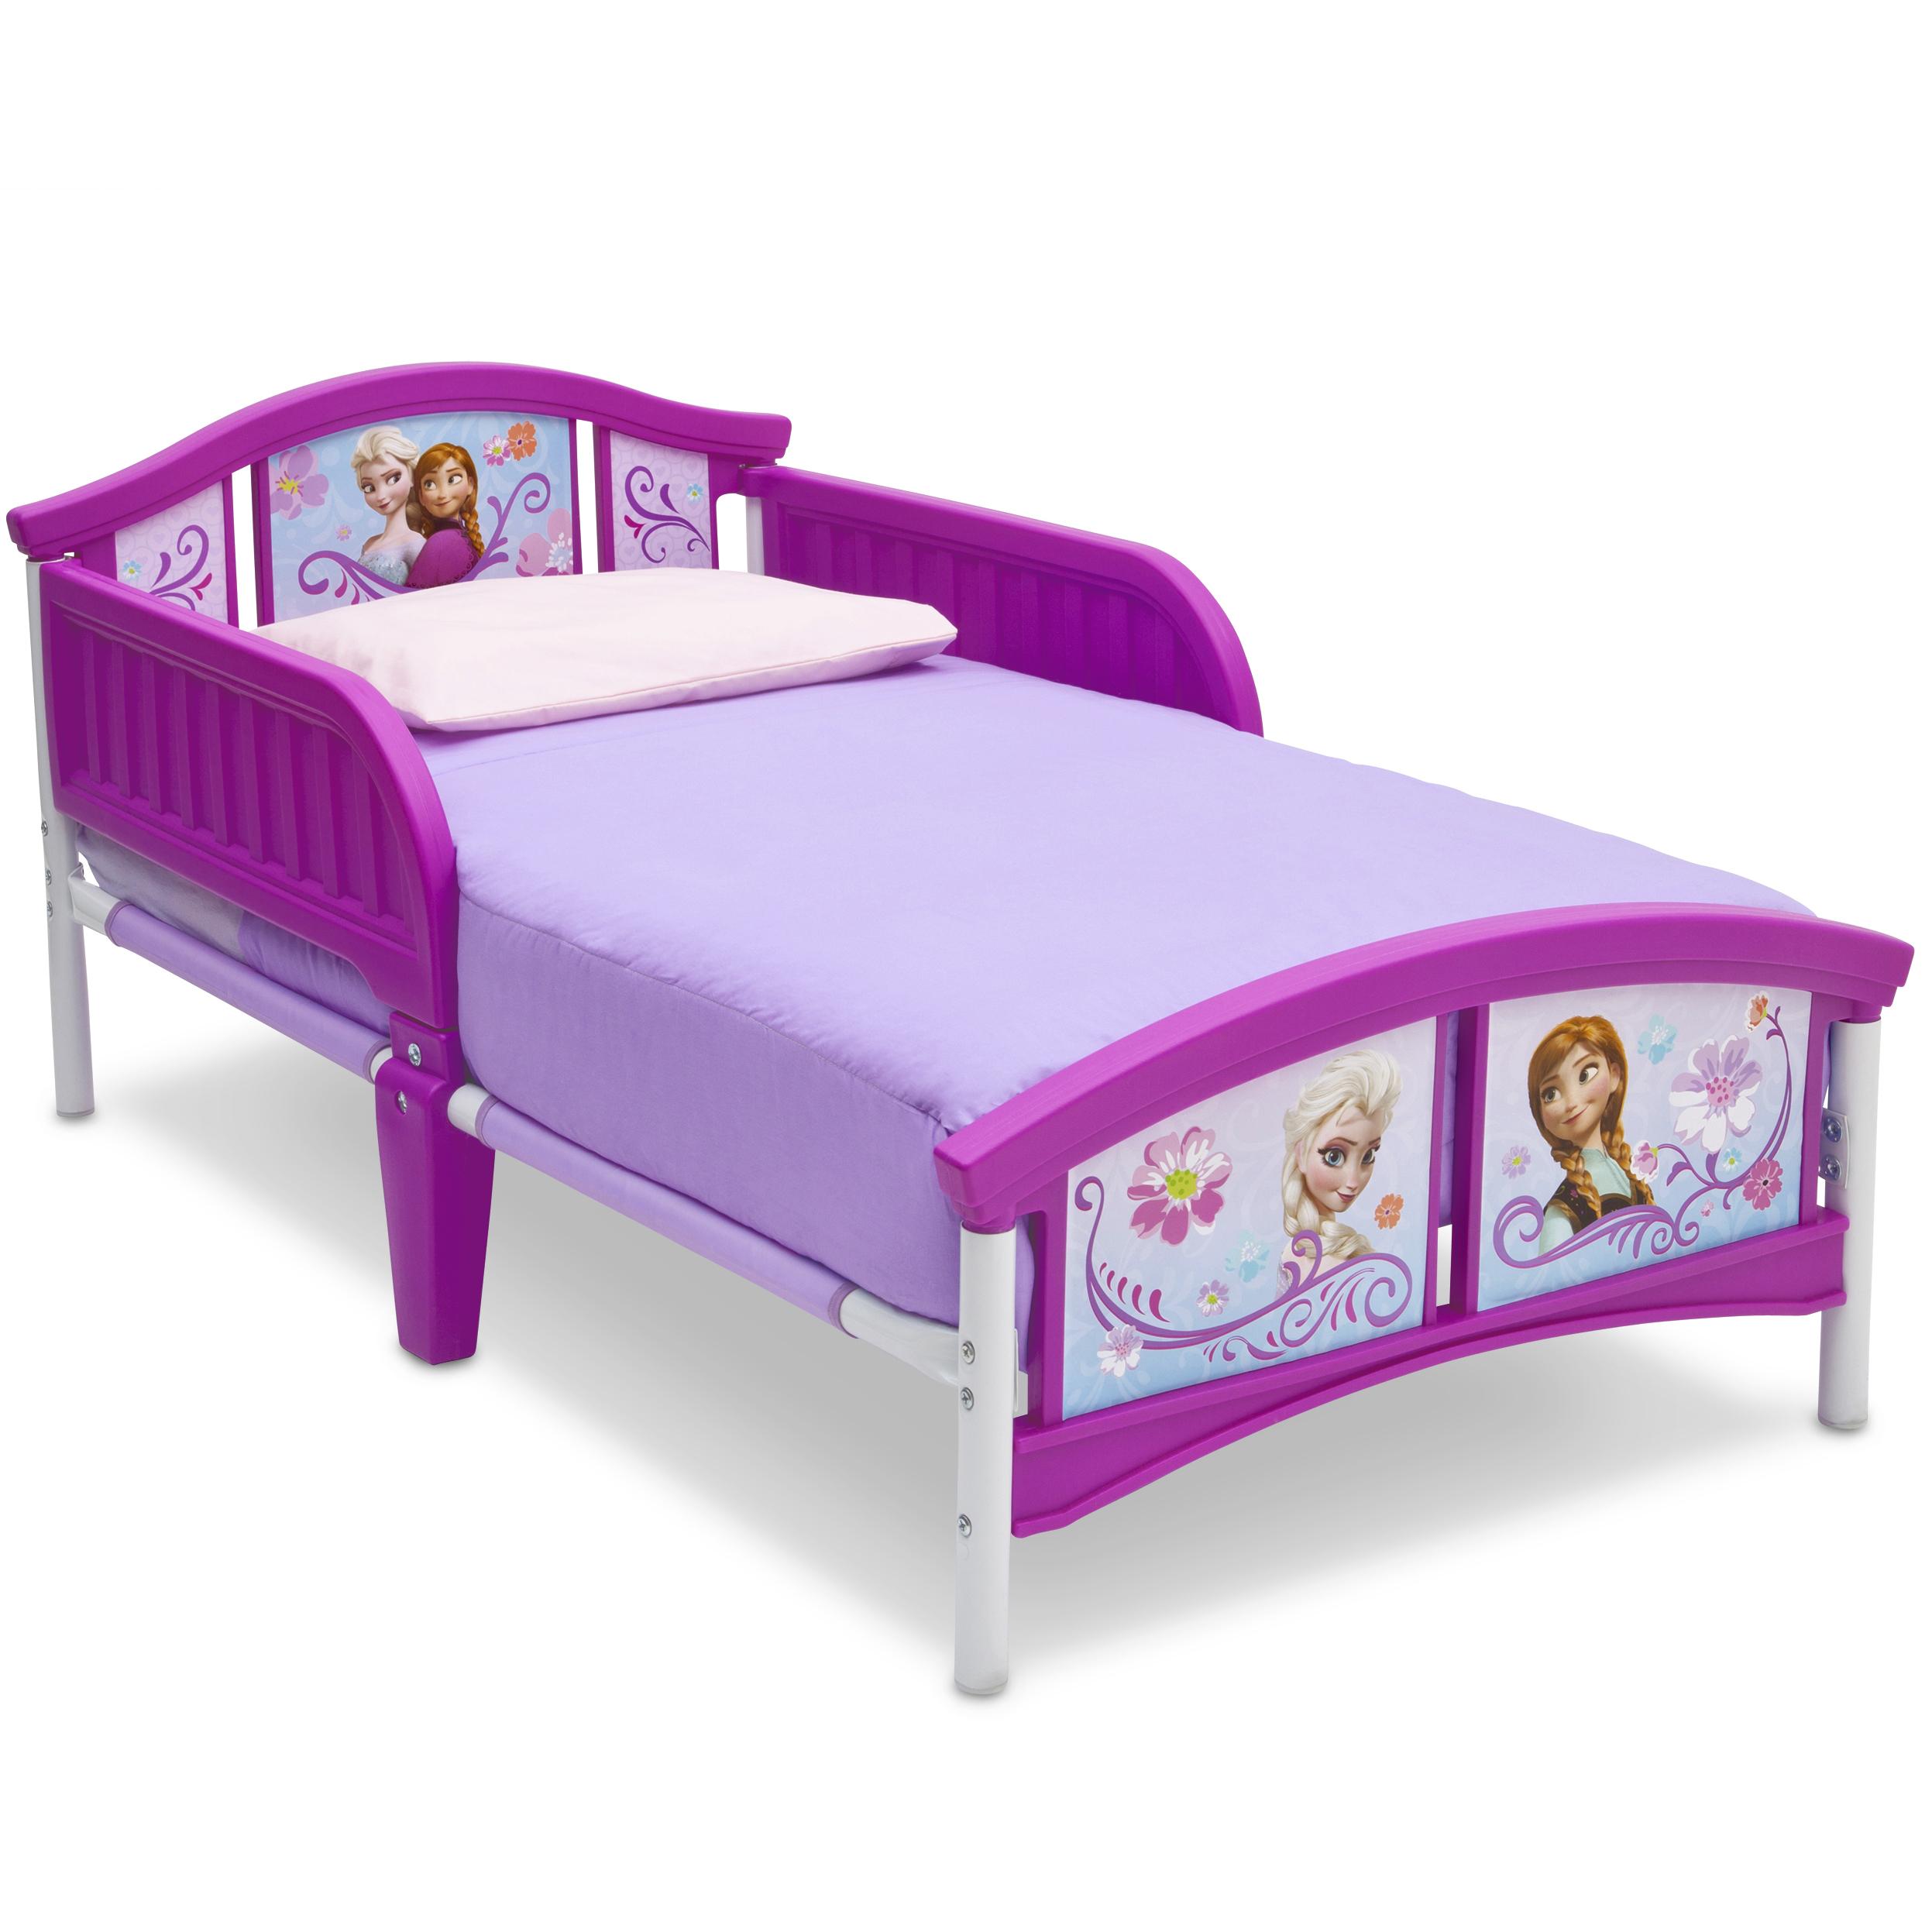 Delta Children Disney Frozen Plastic Toddler Bed, Purple - Walmart.com